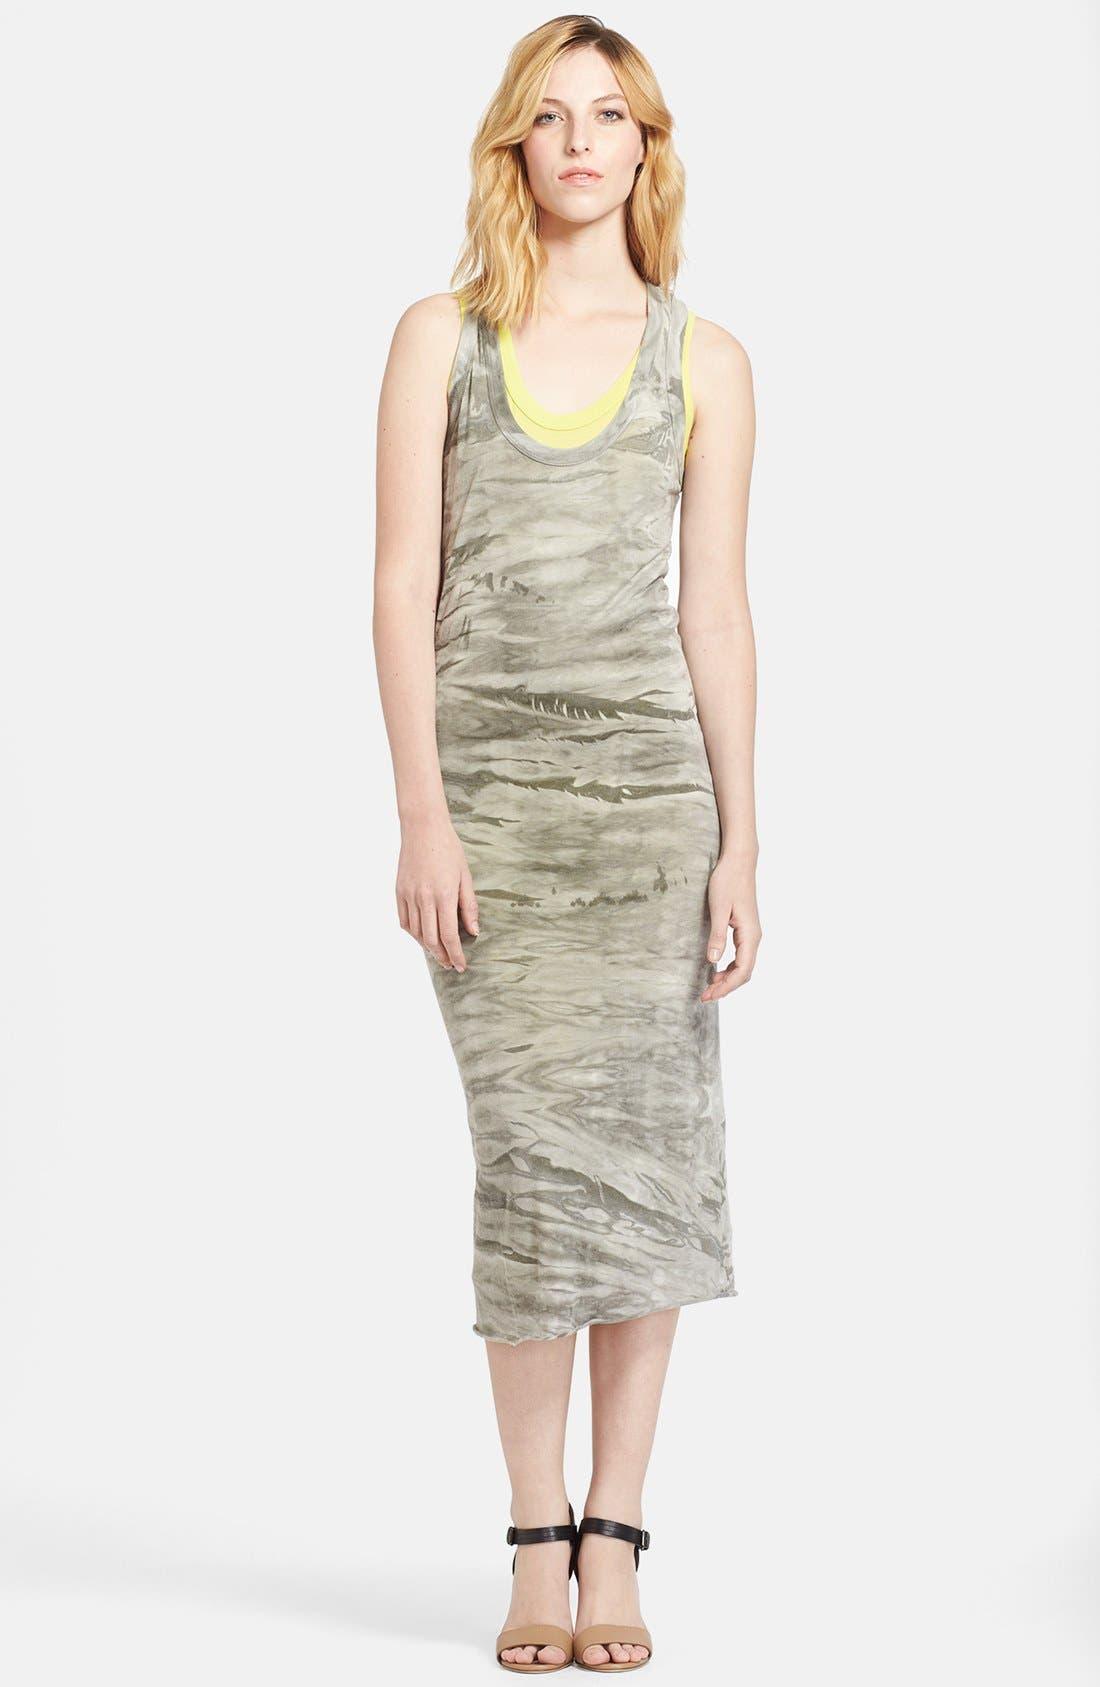 Alternate Image 1 Selected - Enza Costa Double Layer Midi Tank Dress